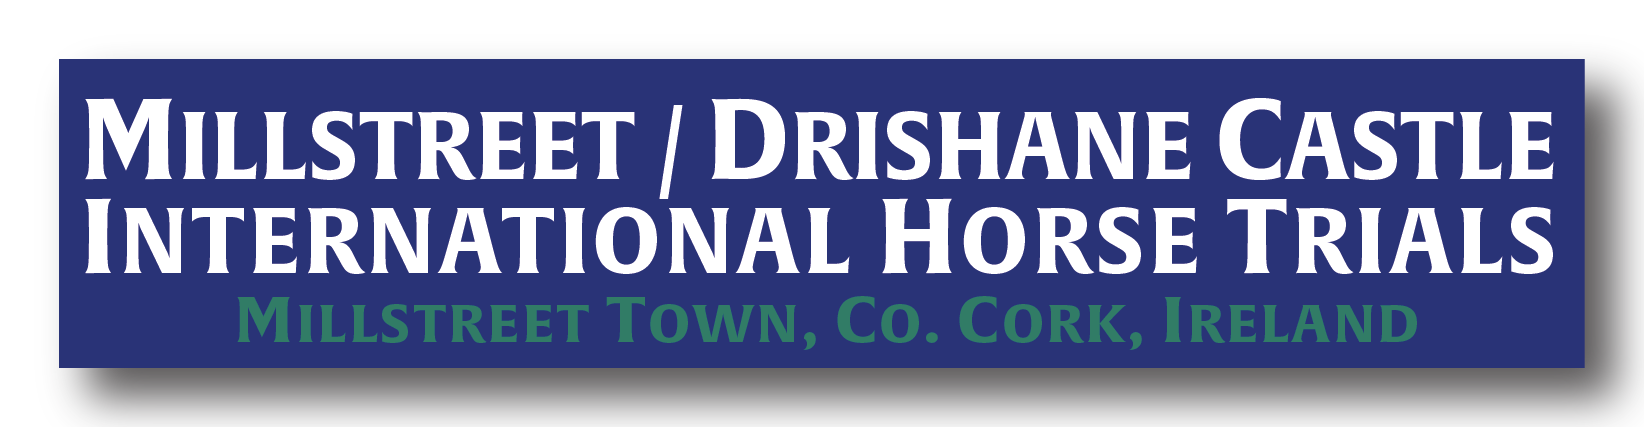 GG_Drishane15_logo